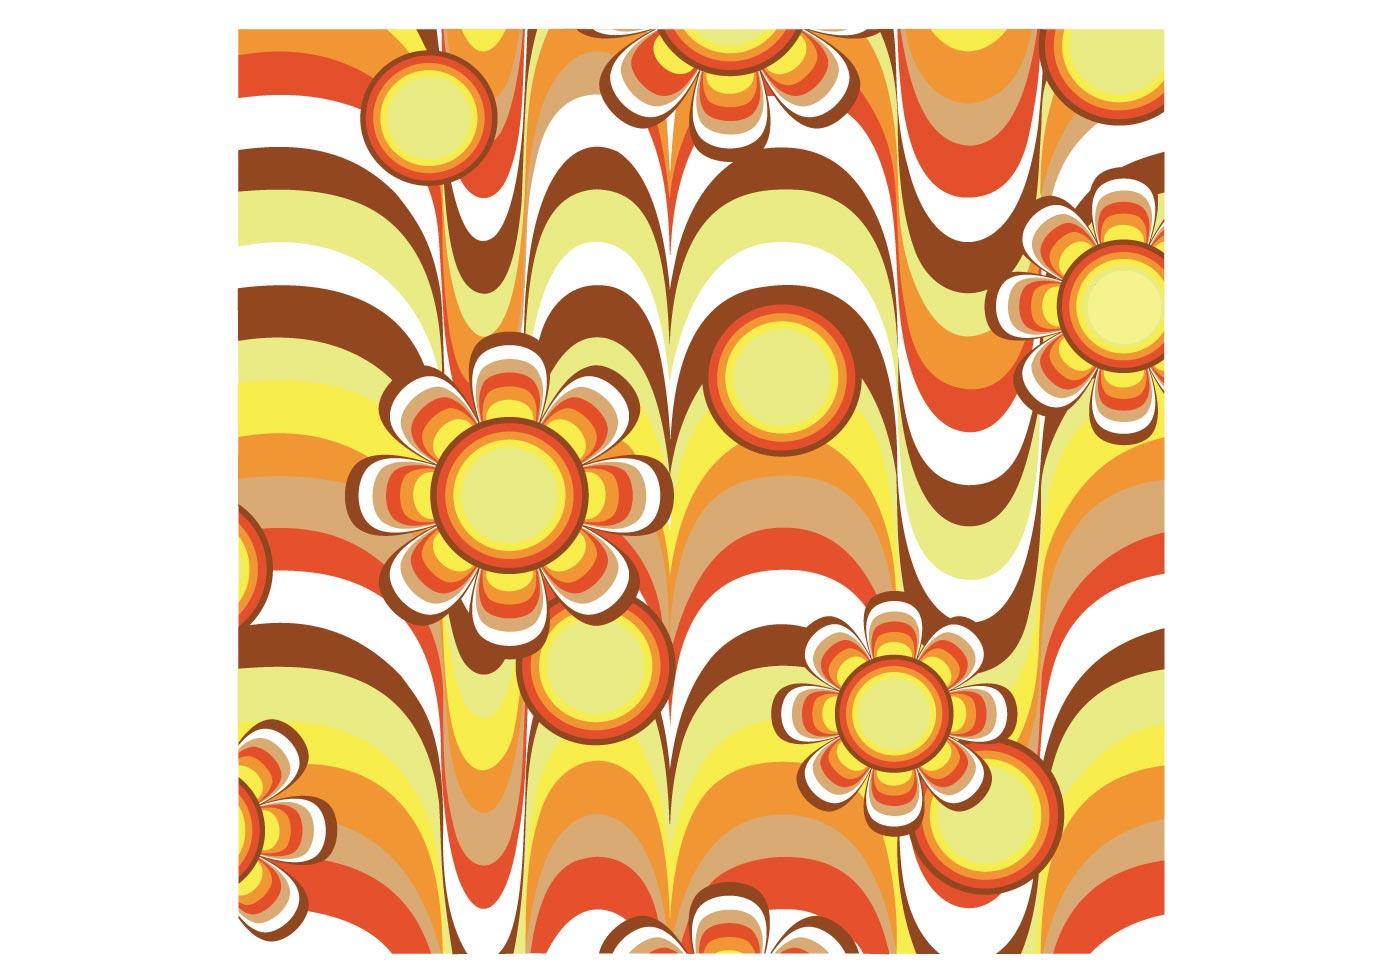 Retro Design Download Free Vector Art Stock Graphics